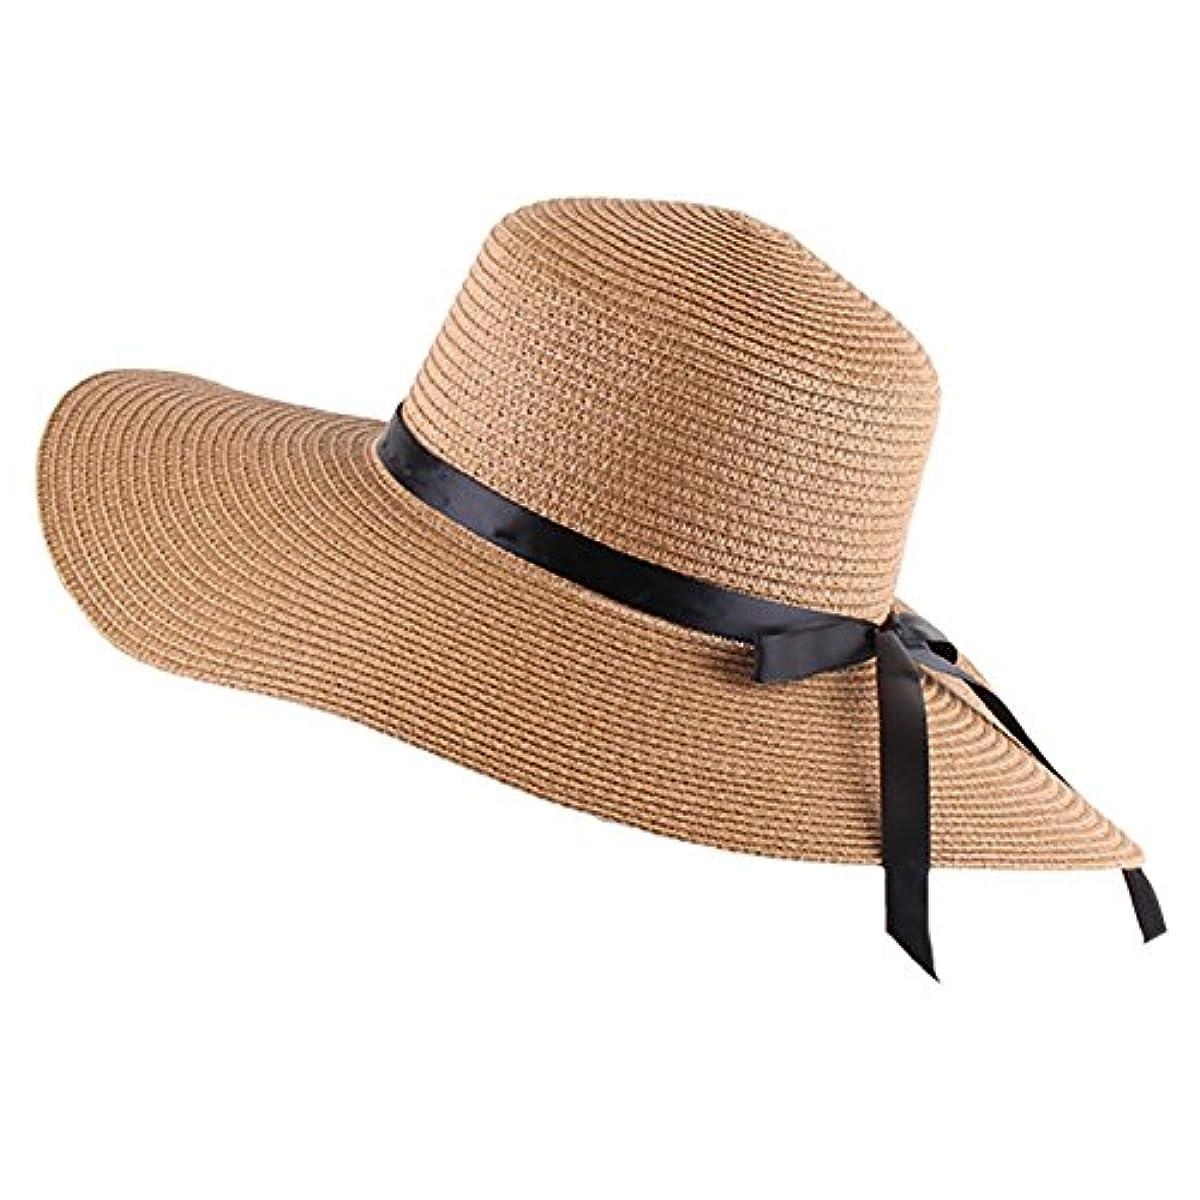 d6707472 Women's Big Brim Sun Hat Floppy Foldable Bowknot Straw Hat Summer ...